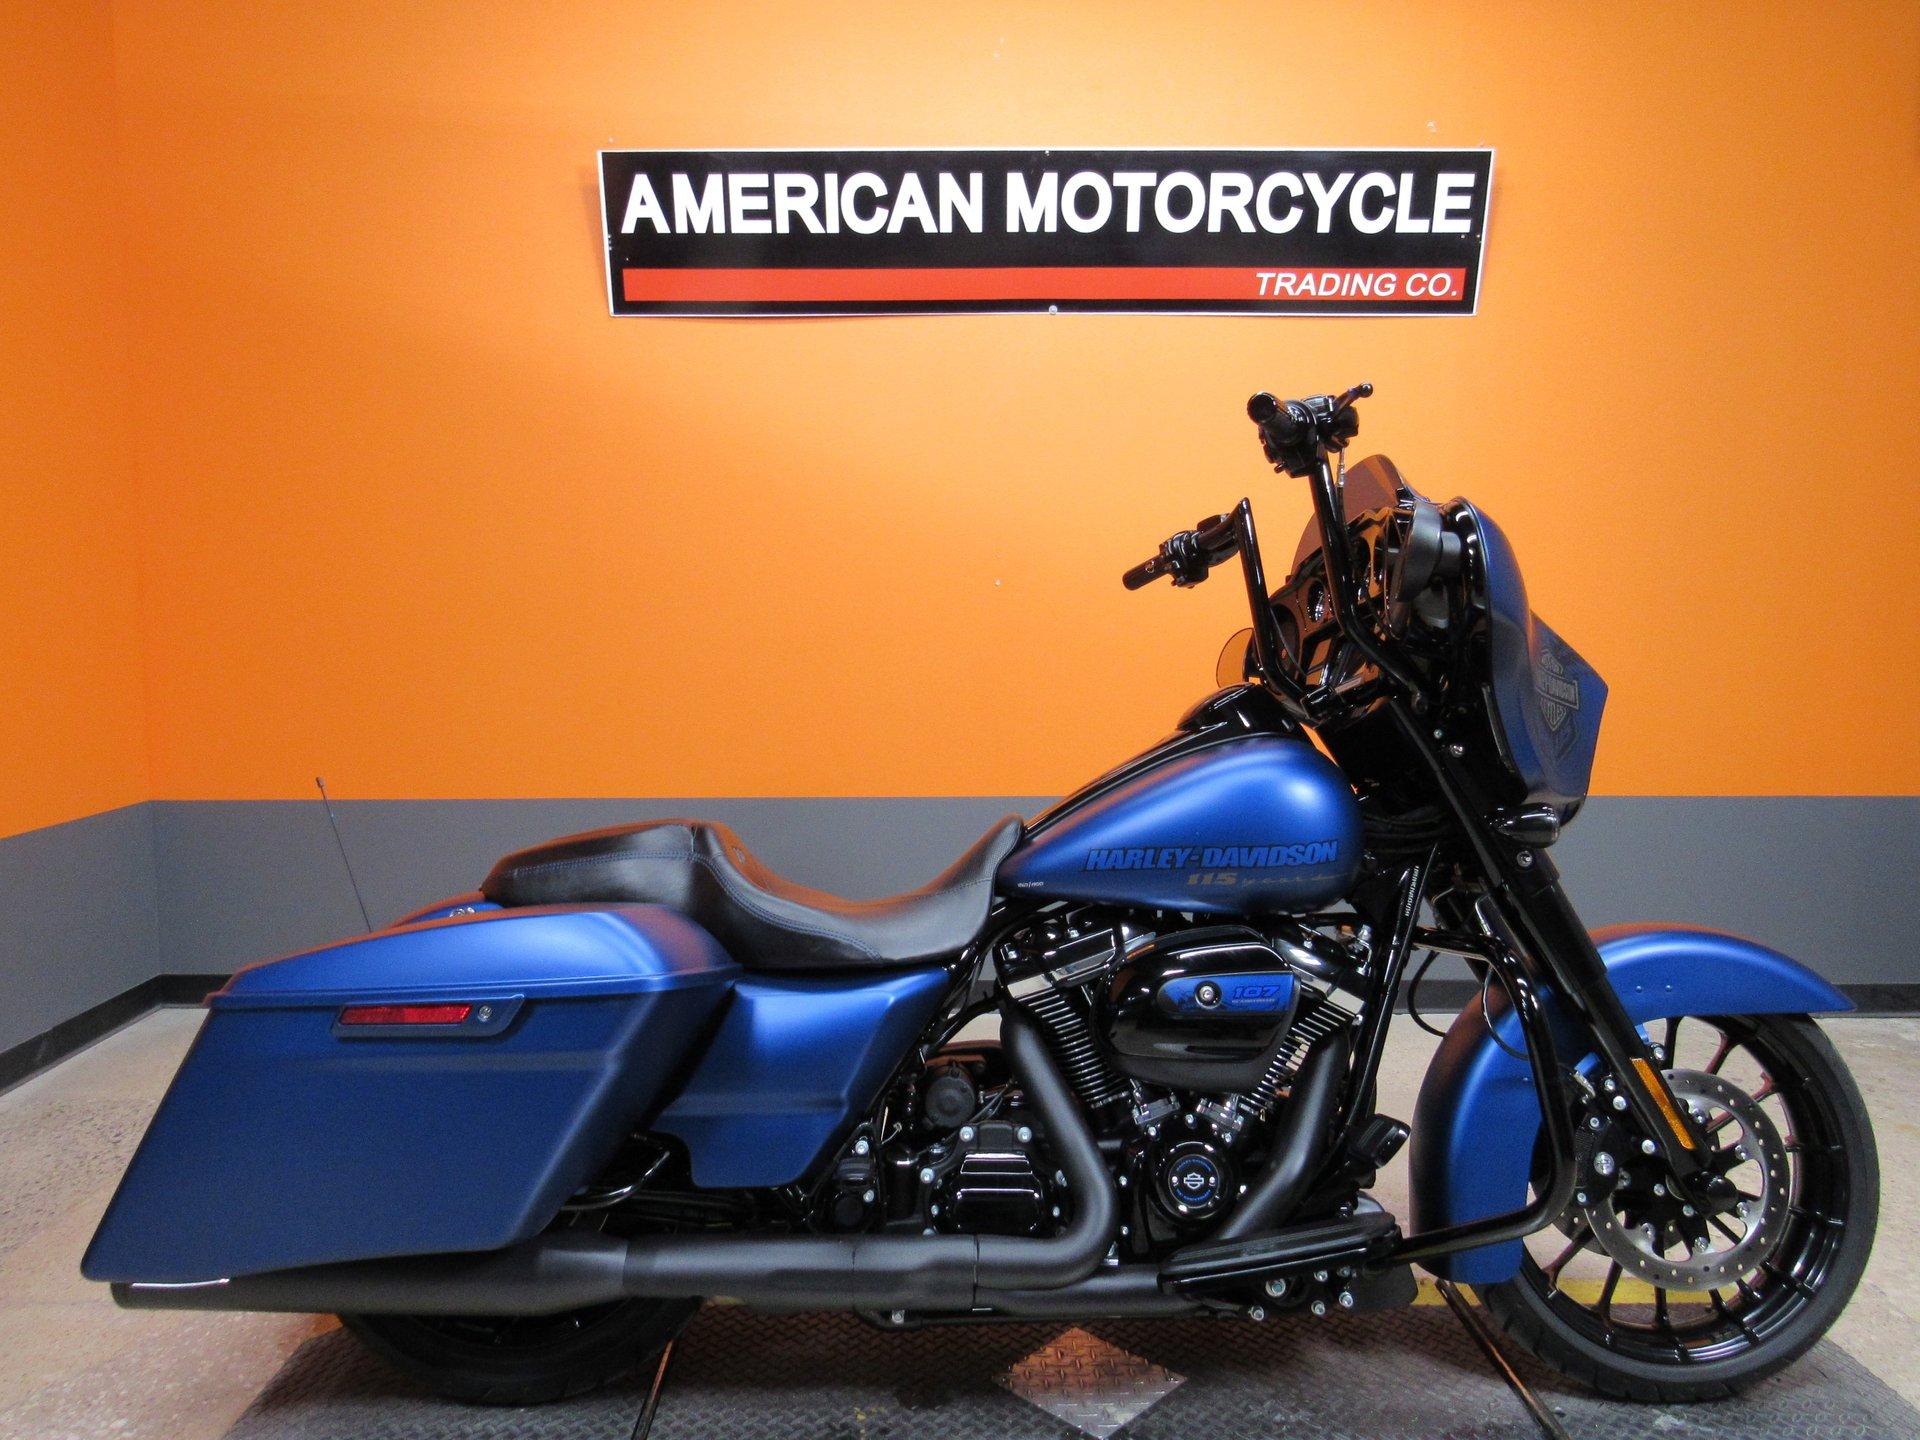 2018 Harley Davidson Street Glide American Motorcycle Trading Company Used Harley Davidson Motorcycles